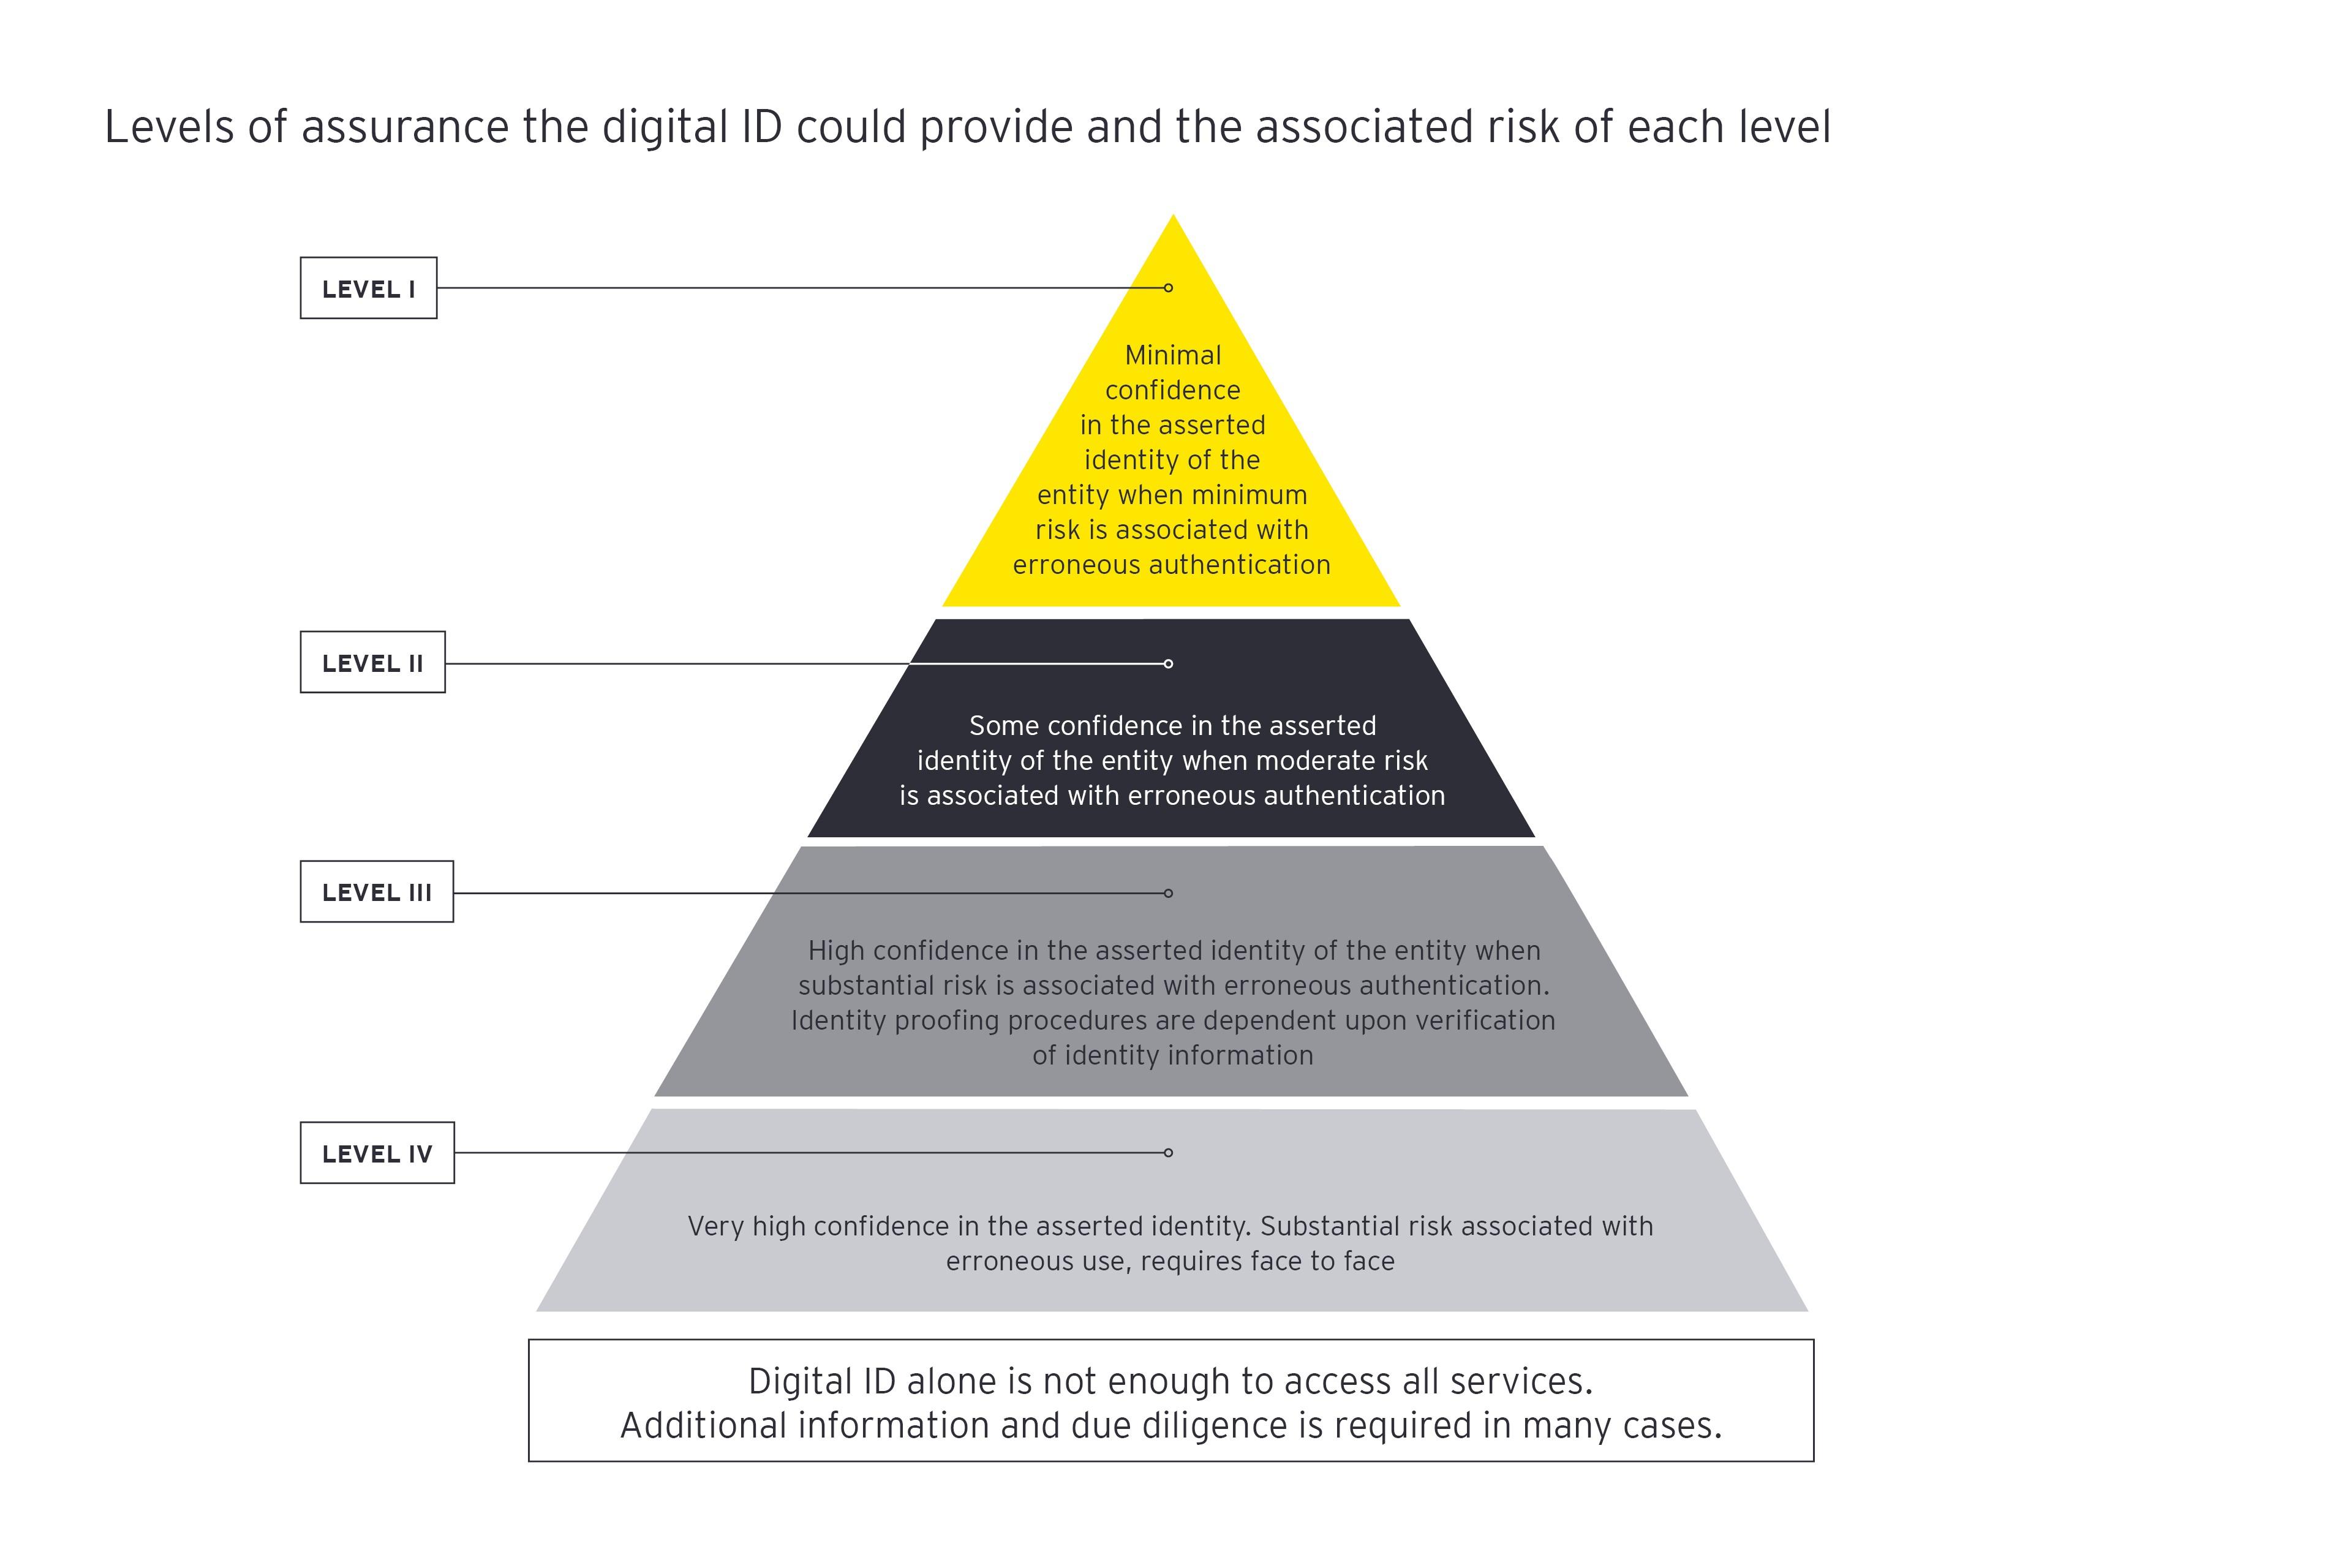 Financial crime digital identity pov eycom infographic